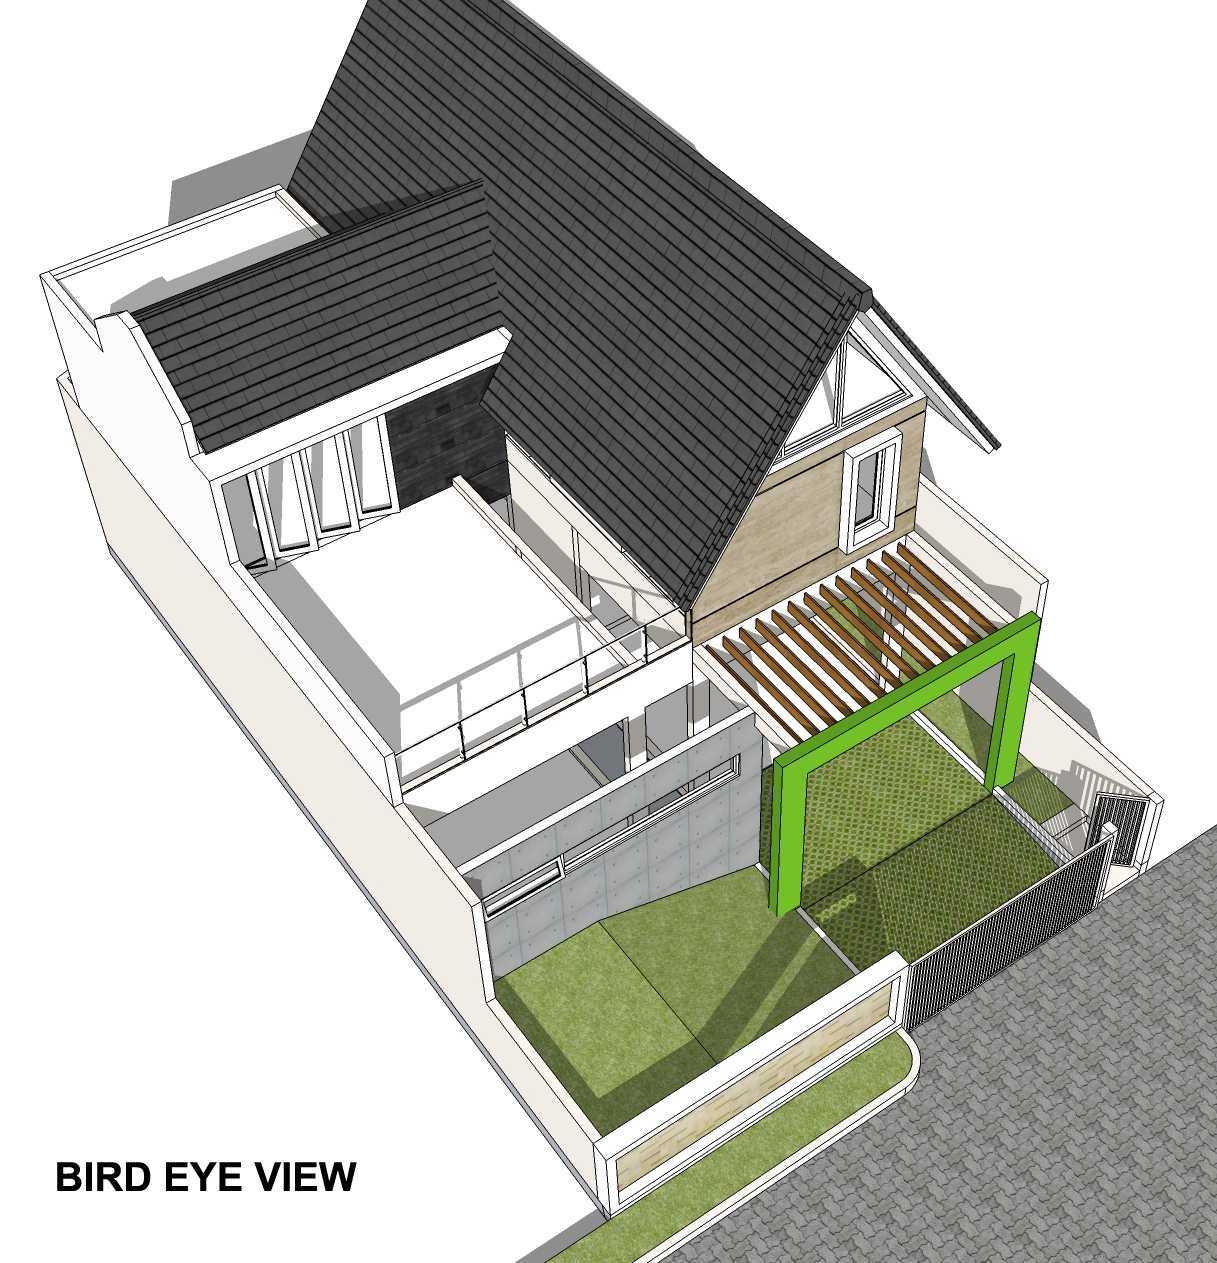 Arsita Studio Architecture Rumah Atap Curam Gresik, Jawa Timur Gresik, Jawa Timur Denah-Lantai-Atap  20116